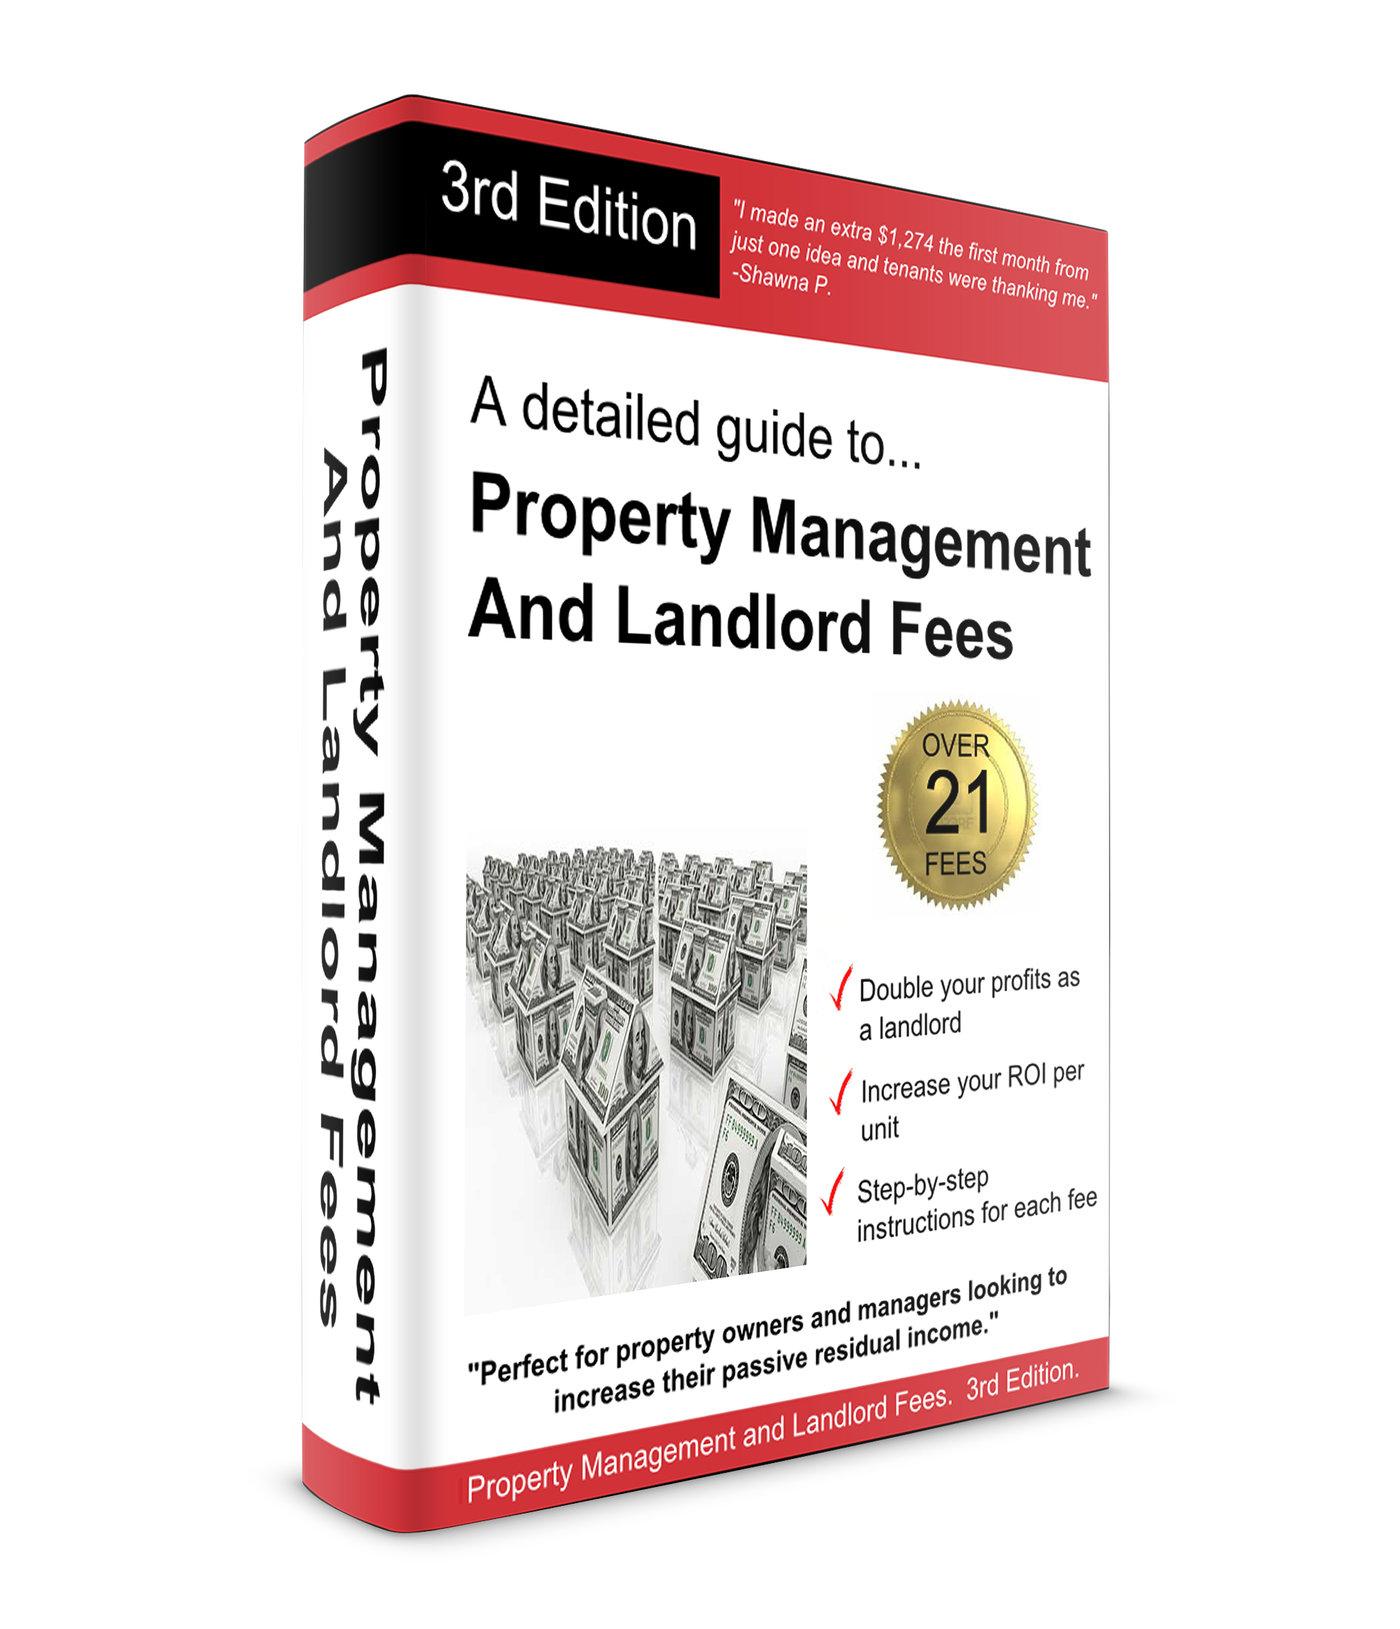 Ebook Cover by Shafin Karim at Coroflot.com